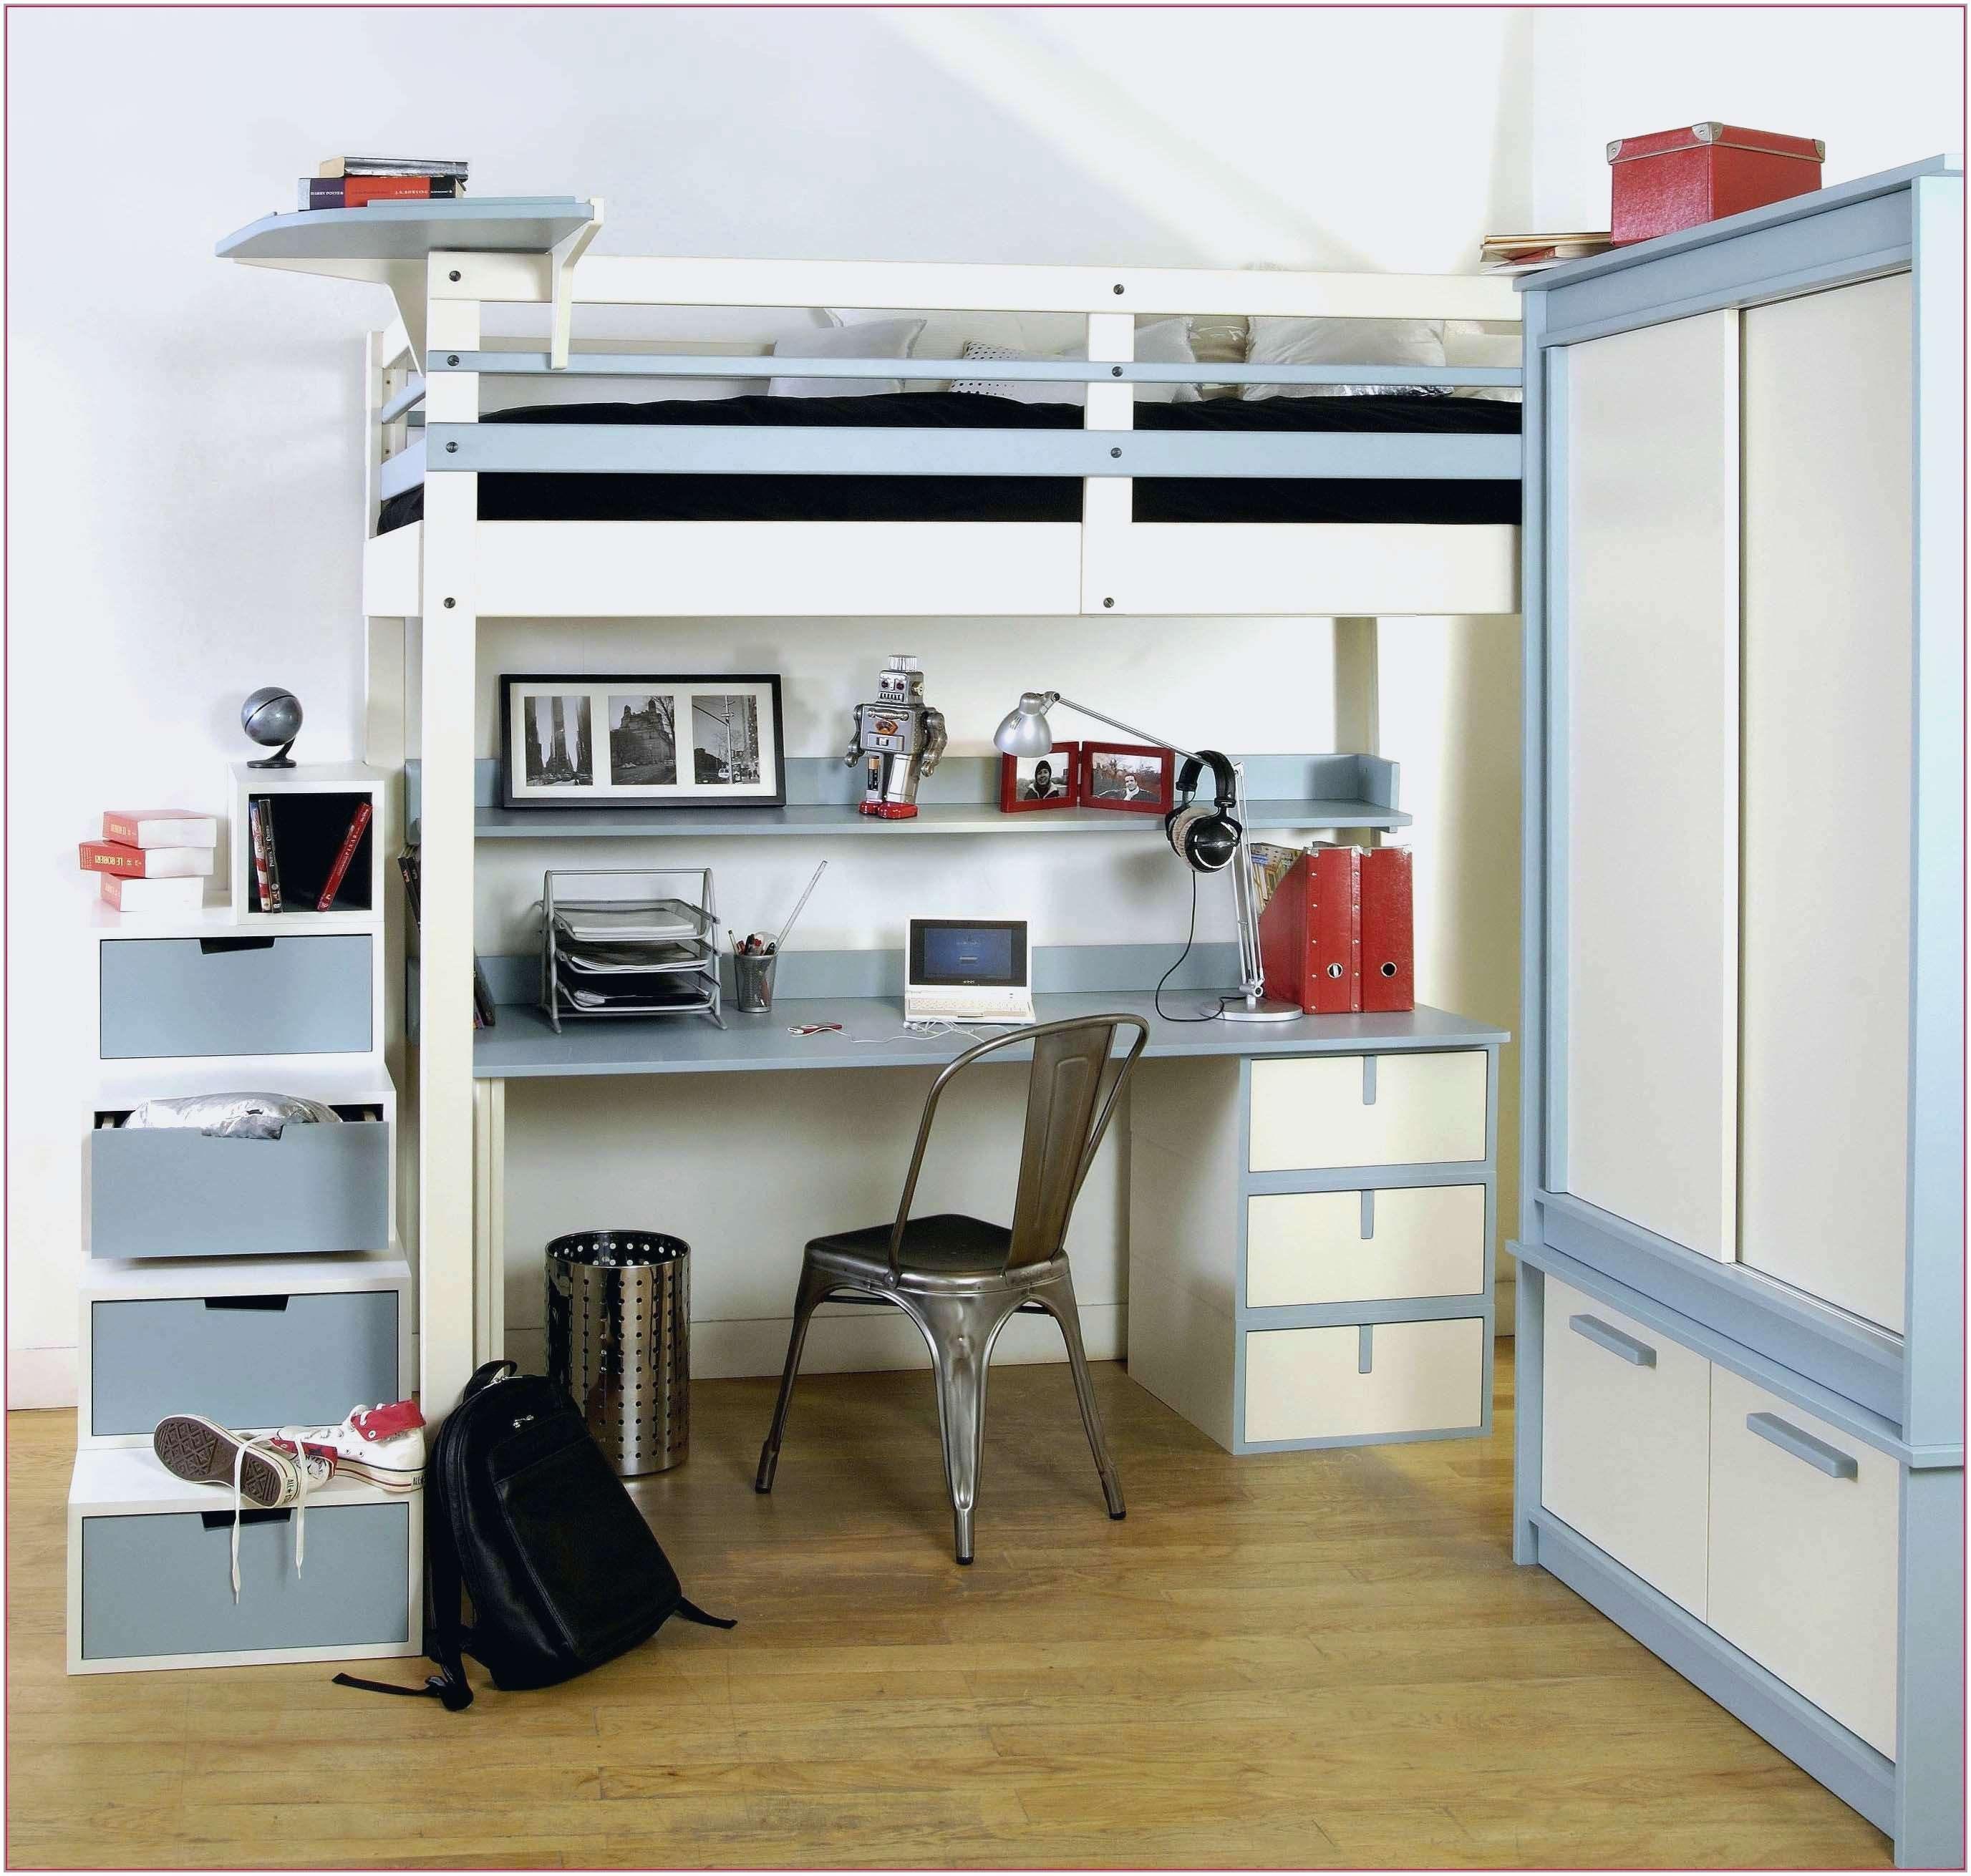 Lit Superposé Adulte Bel Luxe Lit Mezzanine Ikea 2 Places Pour Meilleur Lit Superposé Adulte